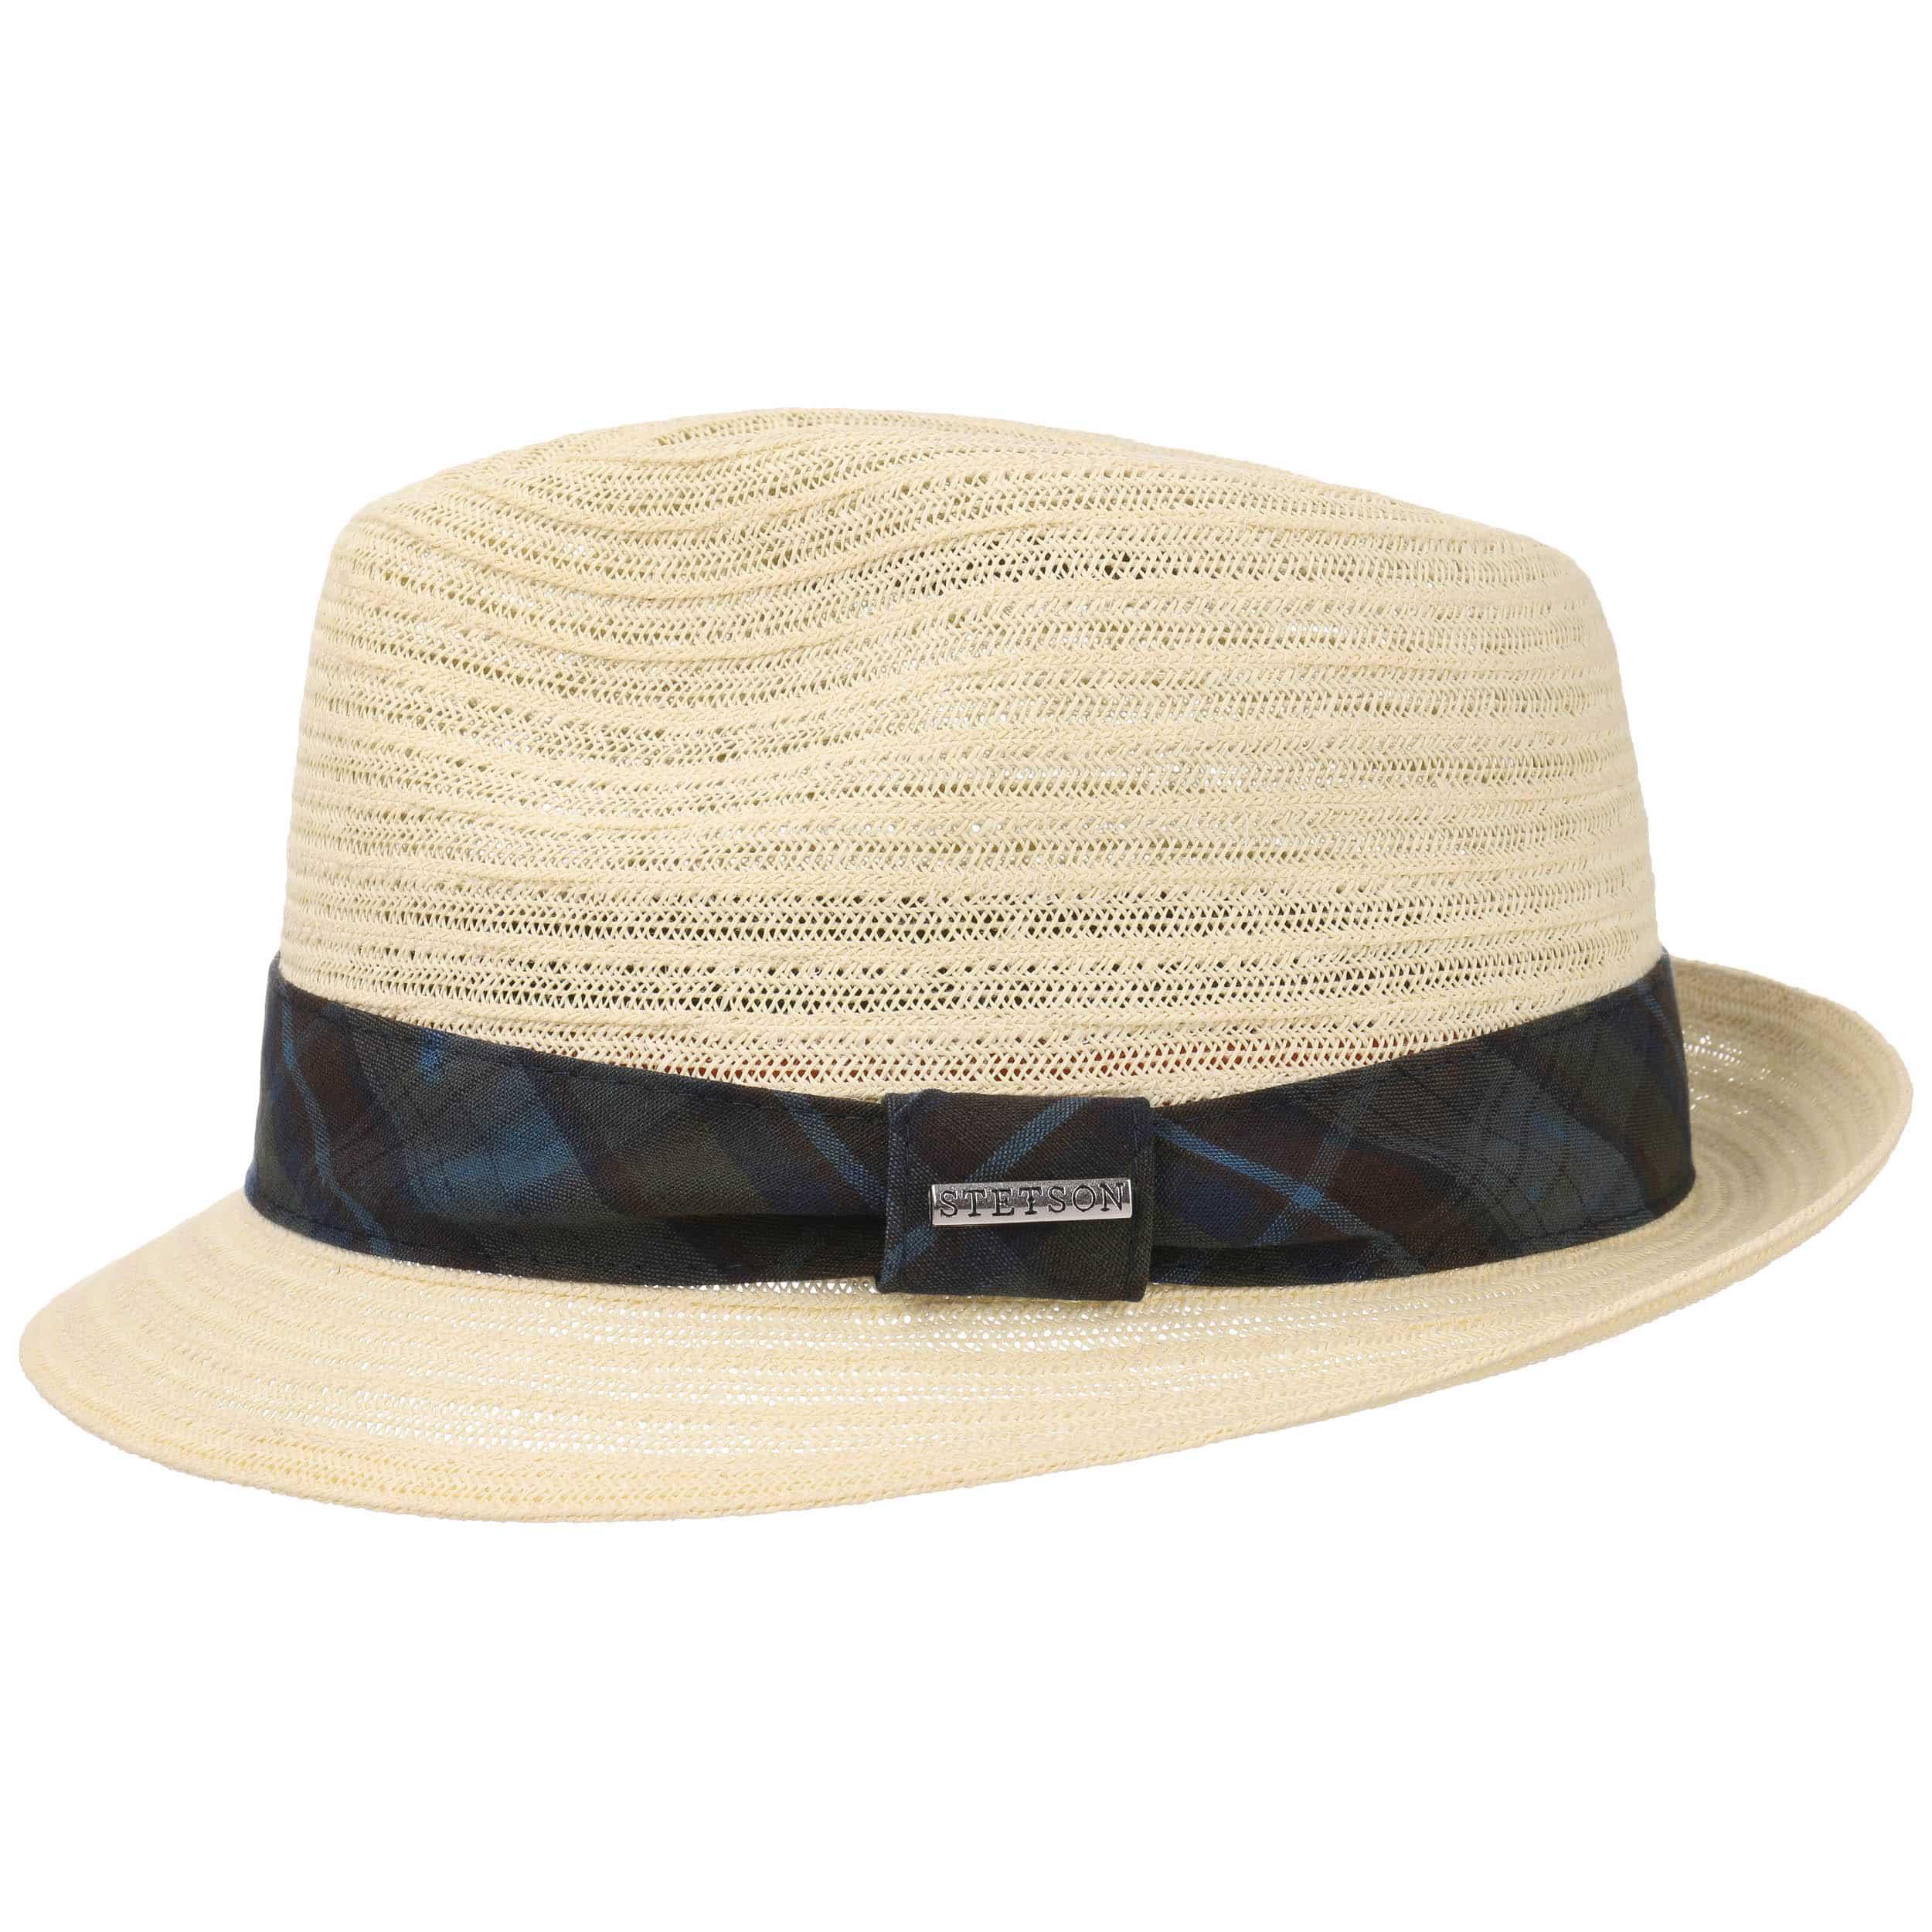 ... Checked Band Toyo Player Hat by Stetson - cream white 4 ... 9b0b0c978a0b